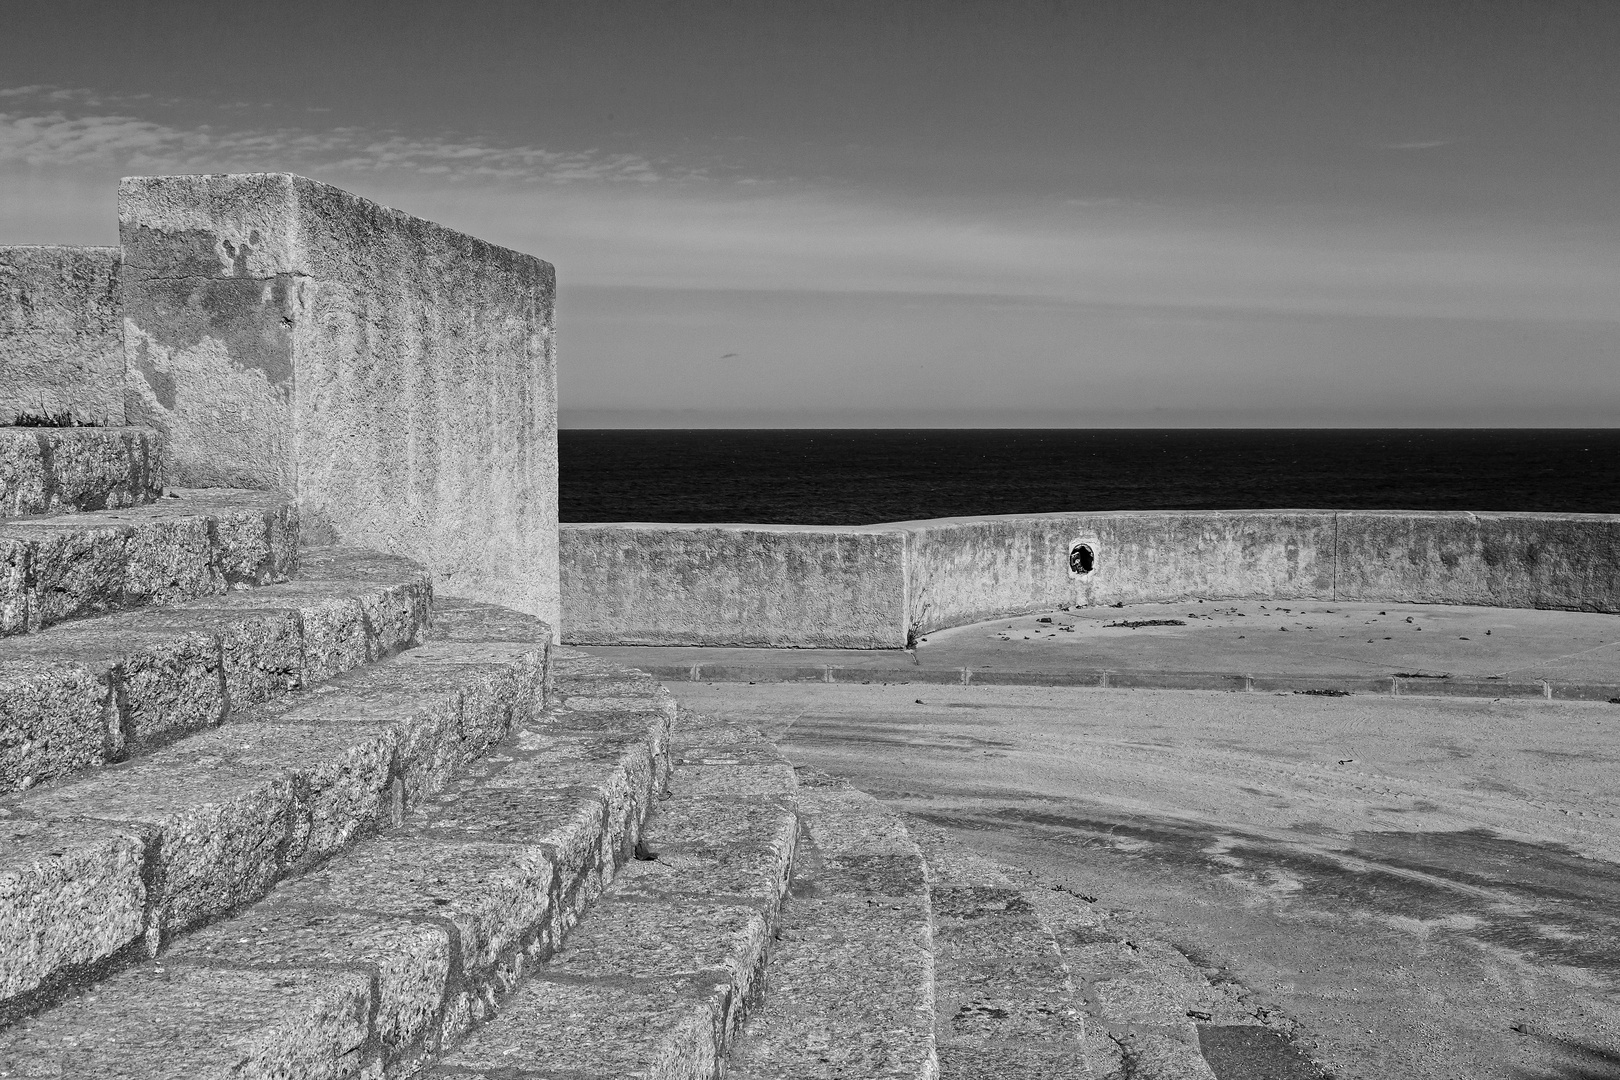 Zitadelle Calvi